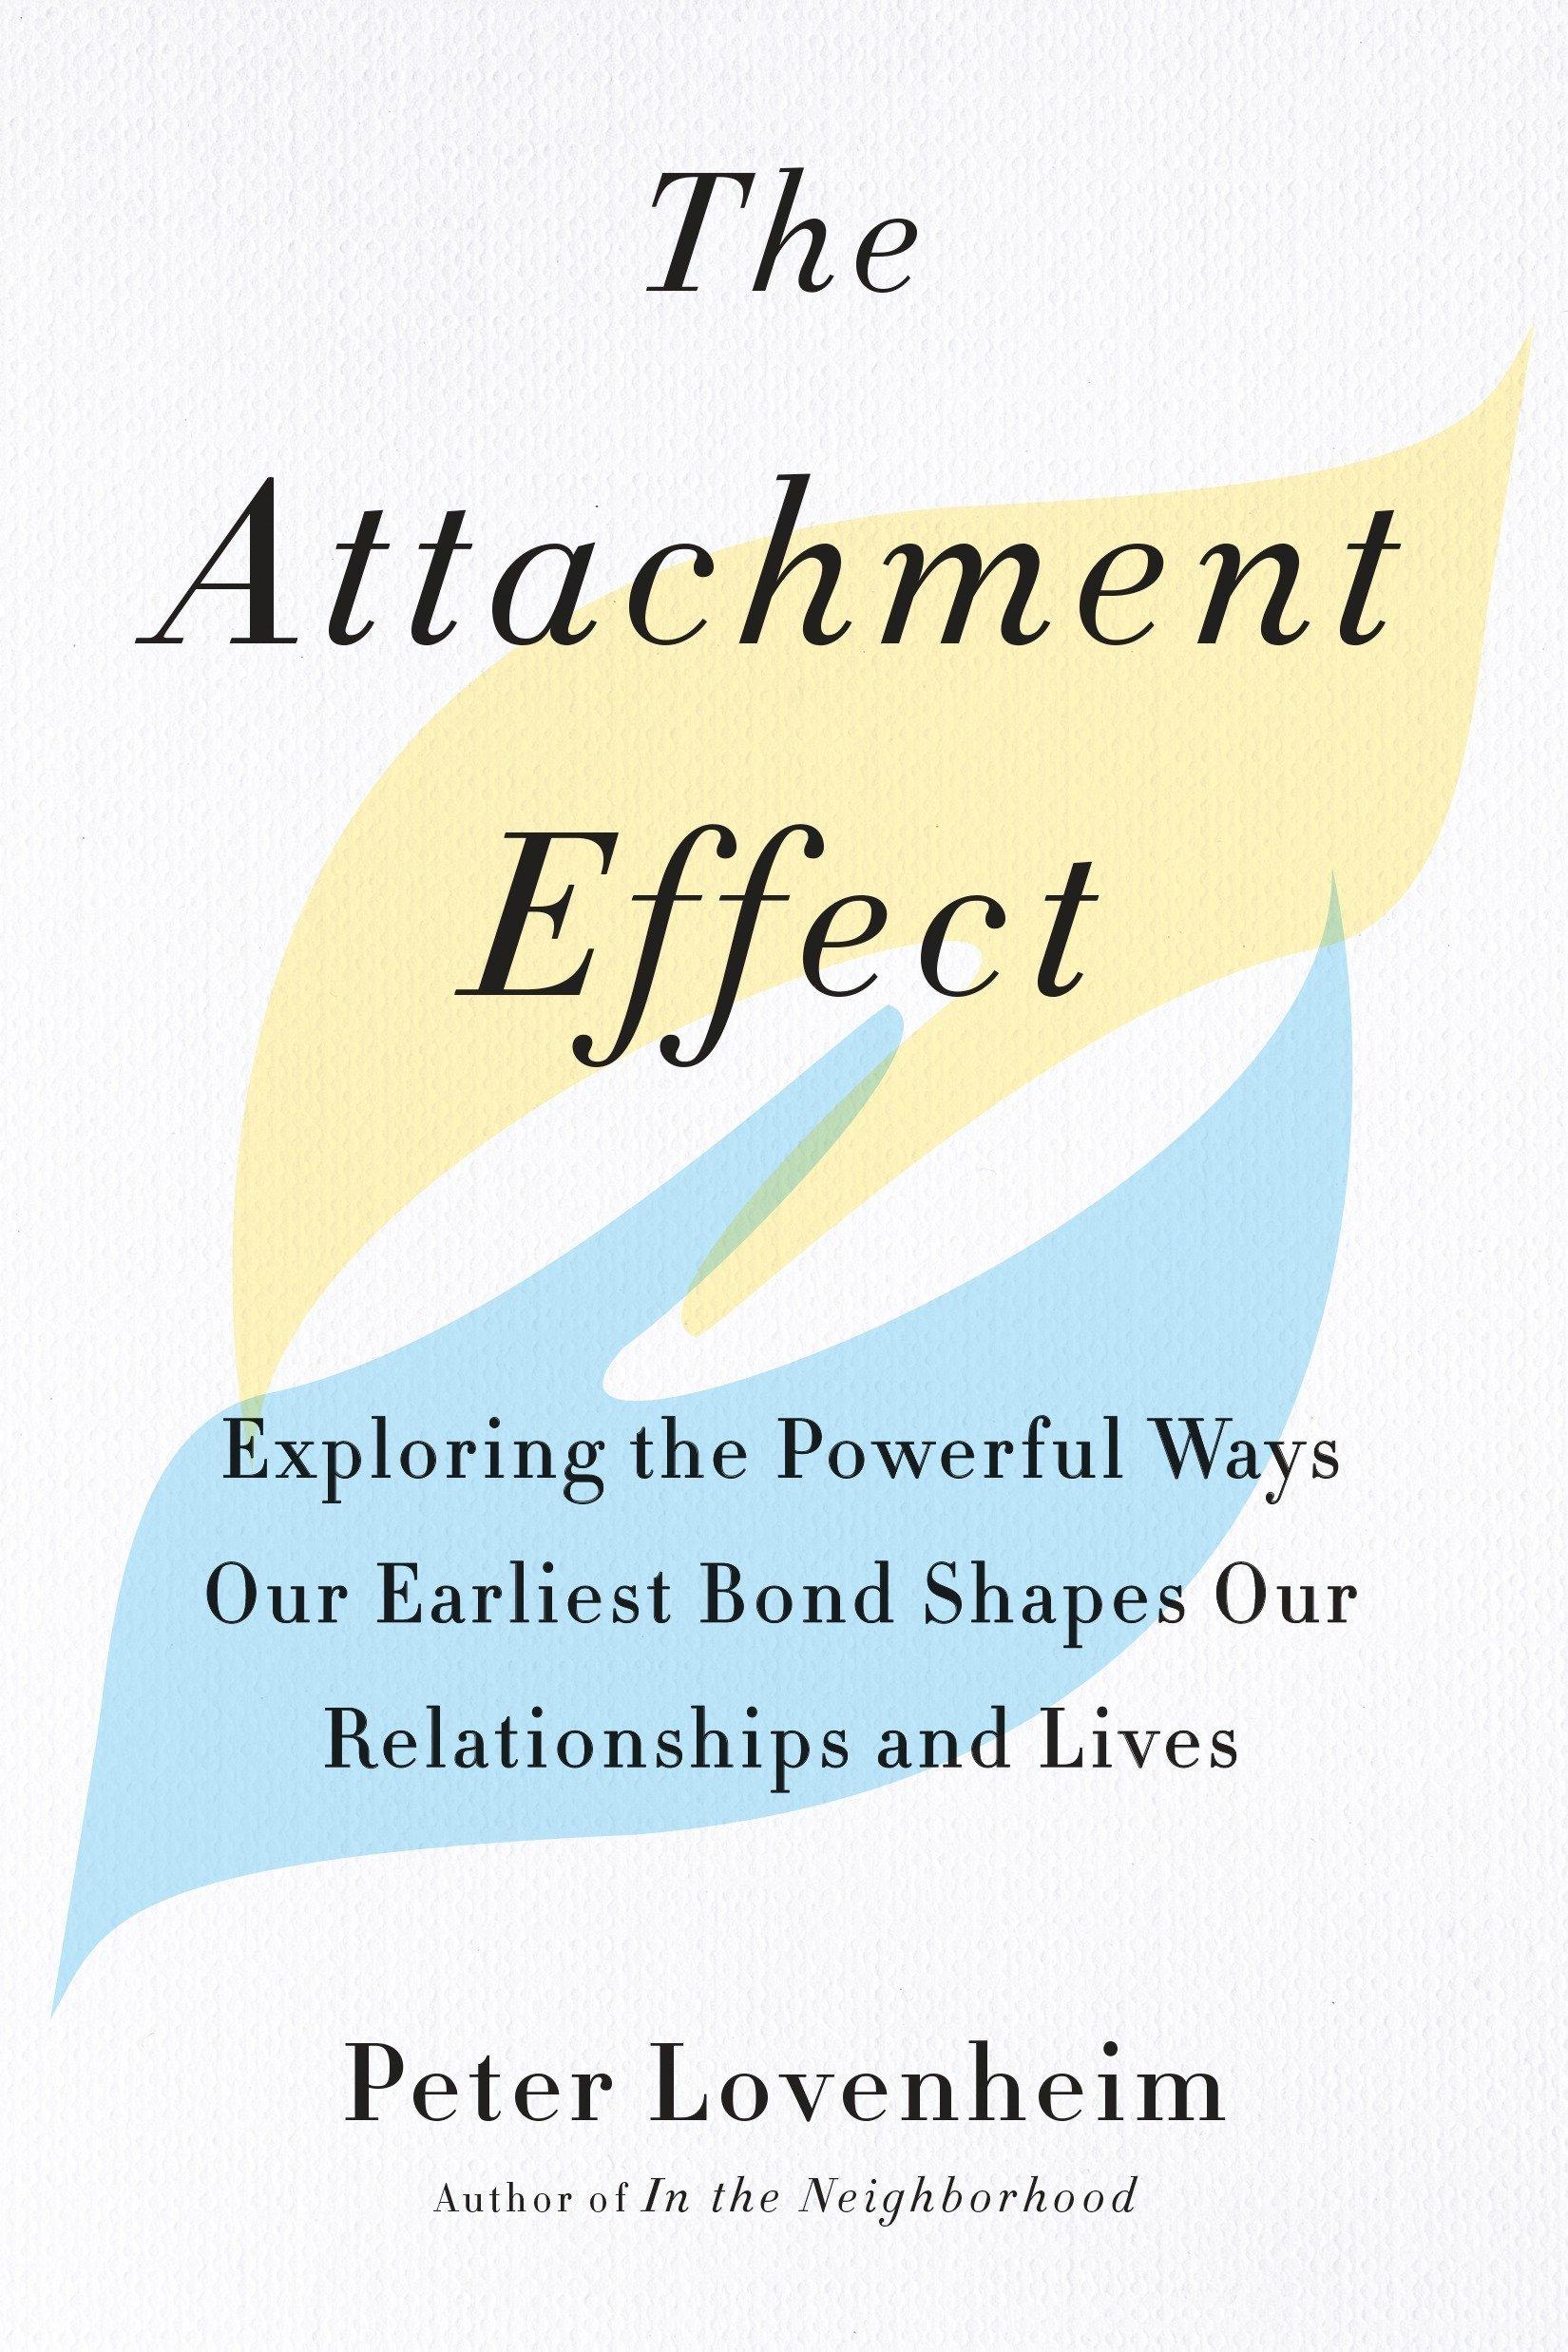 [Peter Lovenheim] The Attachment Effect Exploring